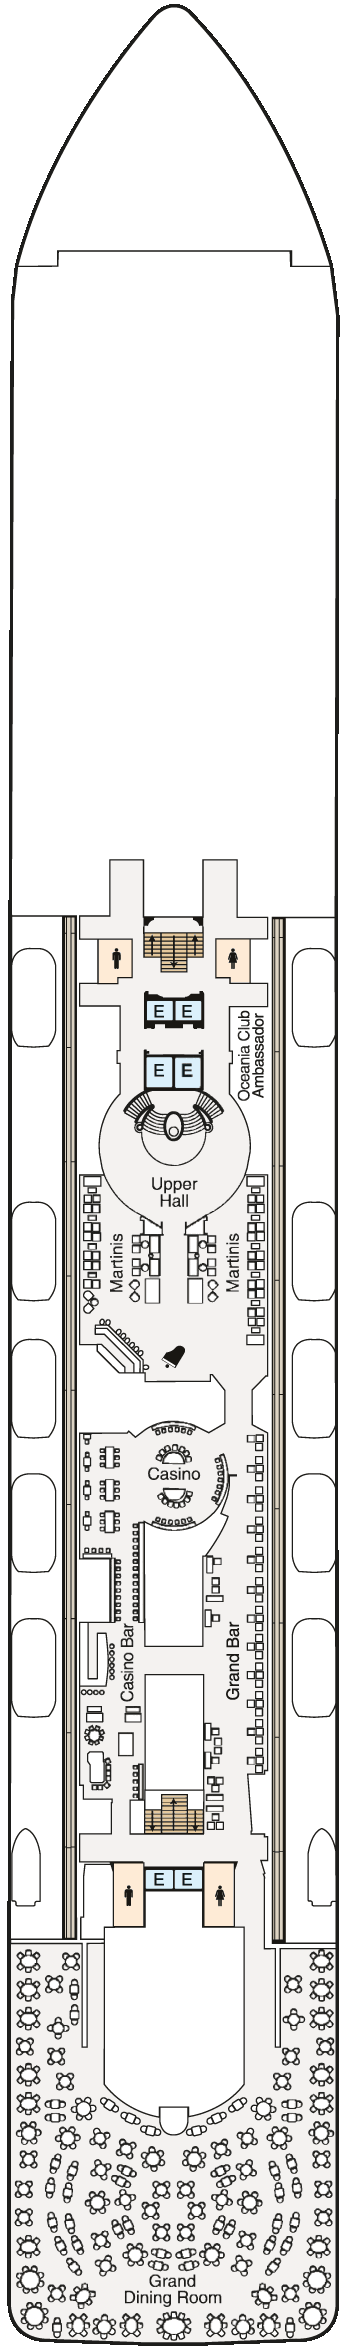 MS Marina - Deck 6